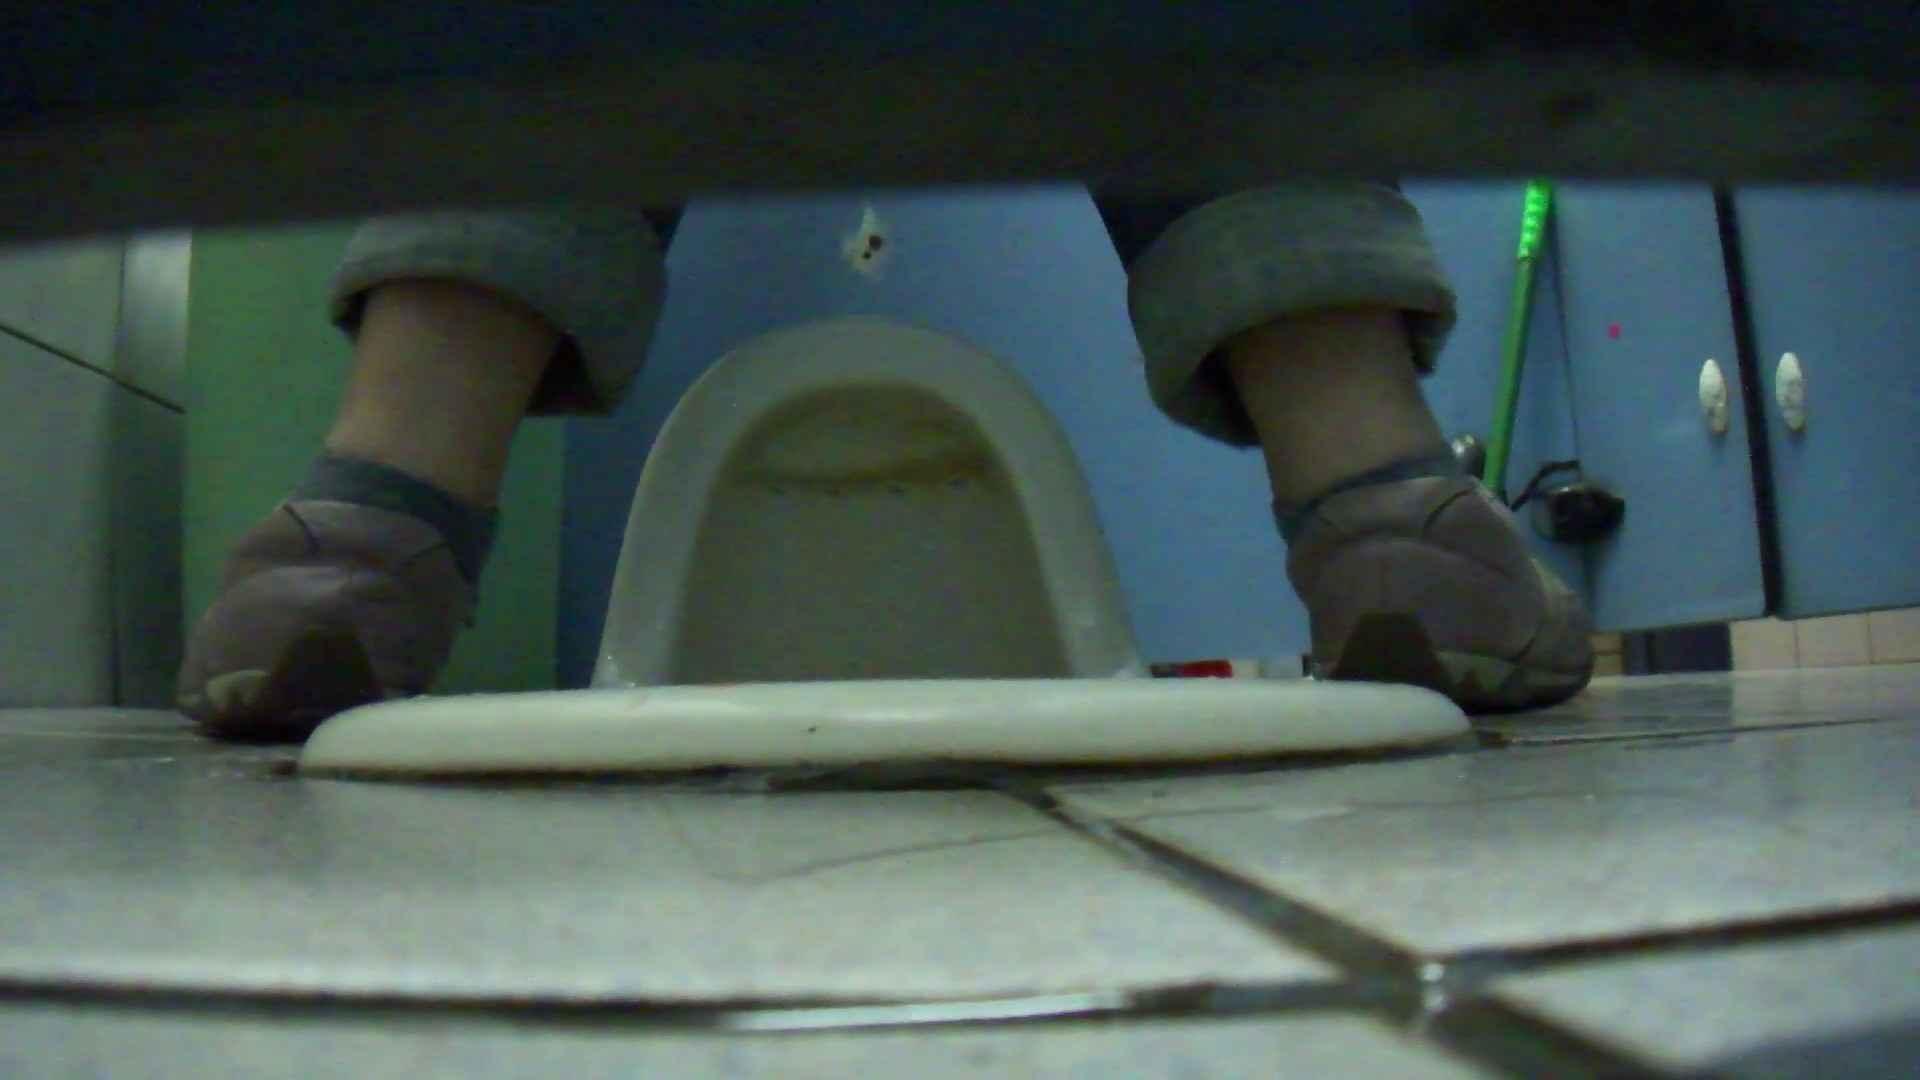 JD盗撮 美女の洗面所の秘密 Vol.78 高画質動画 ぱこり動画紹介 89画像 46